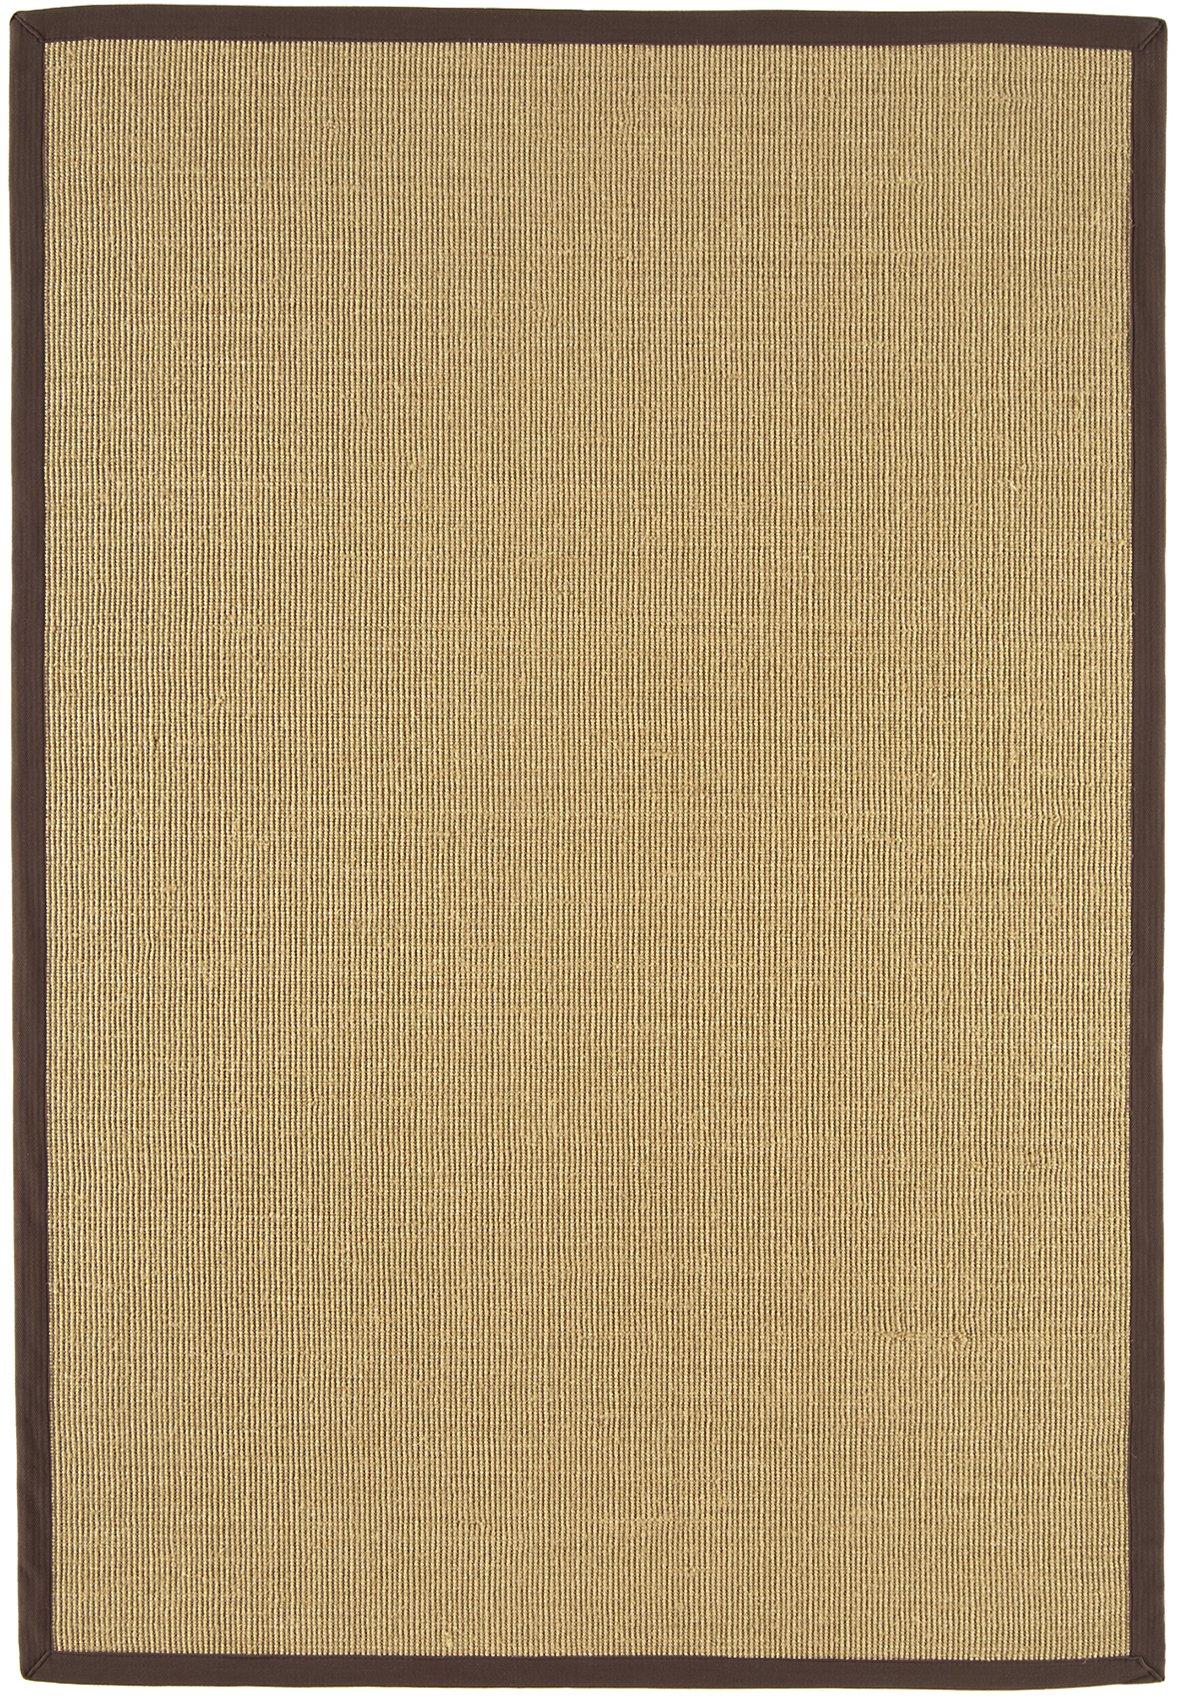 Sisal Rug Chocolate Linen